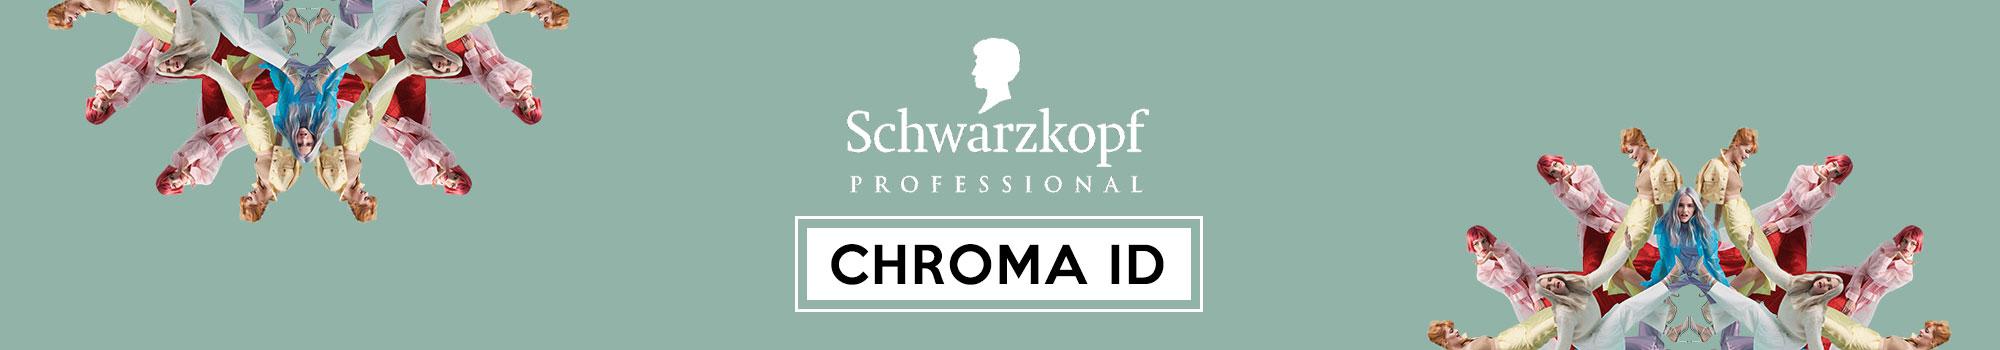 Chroma ID Schwarzkopf Profesional